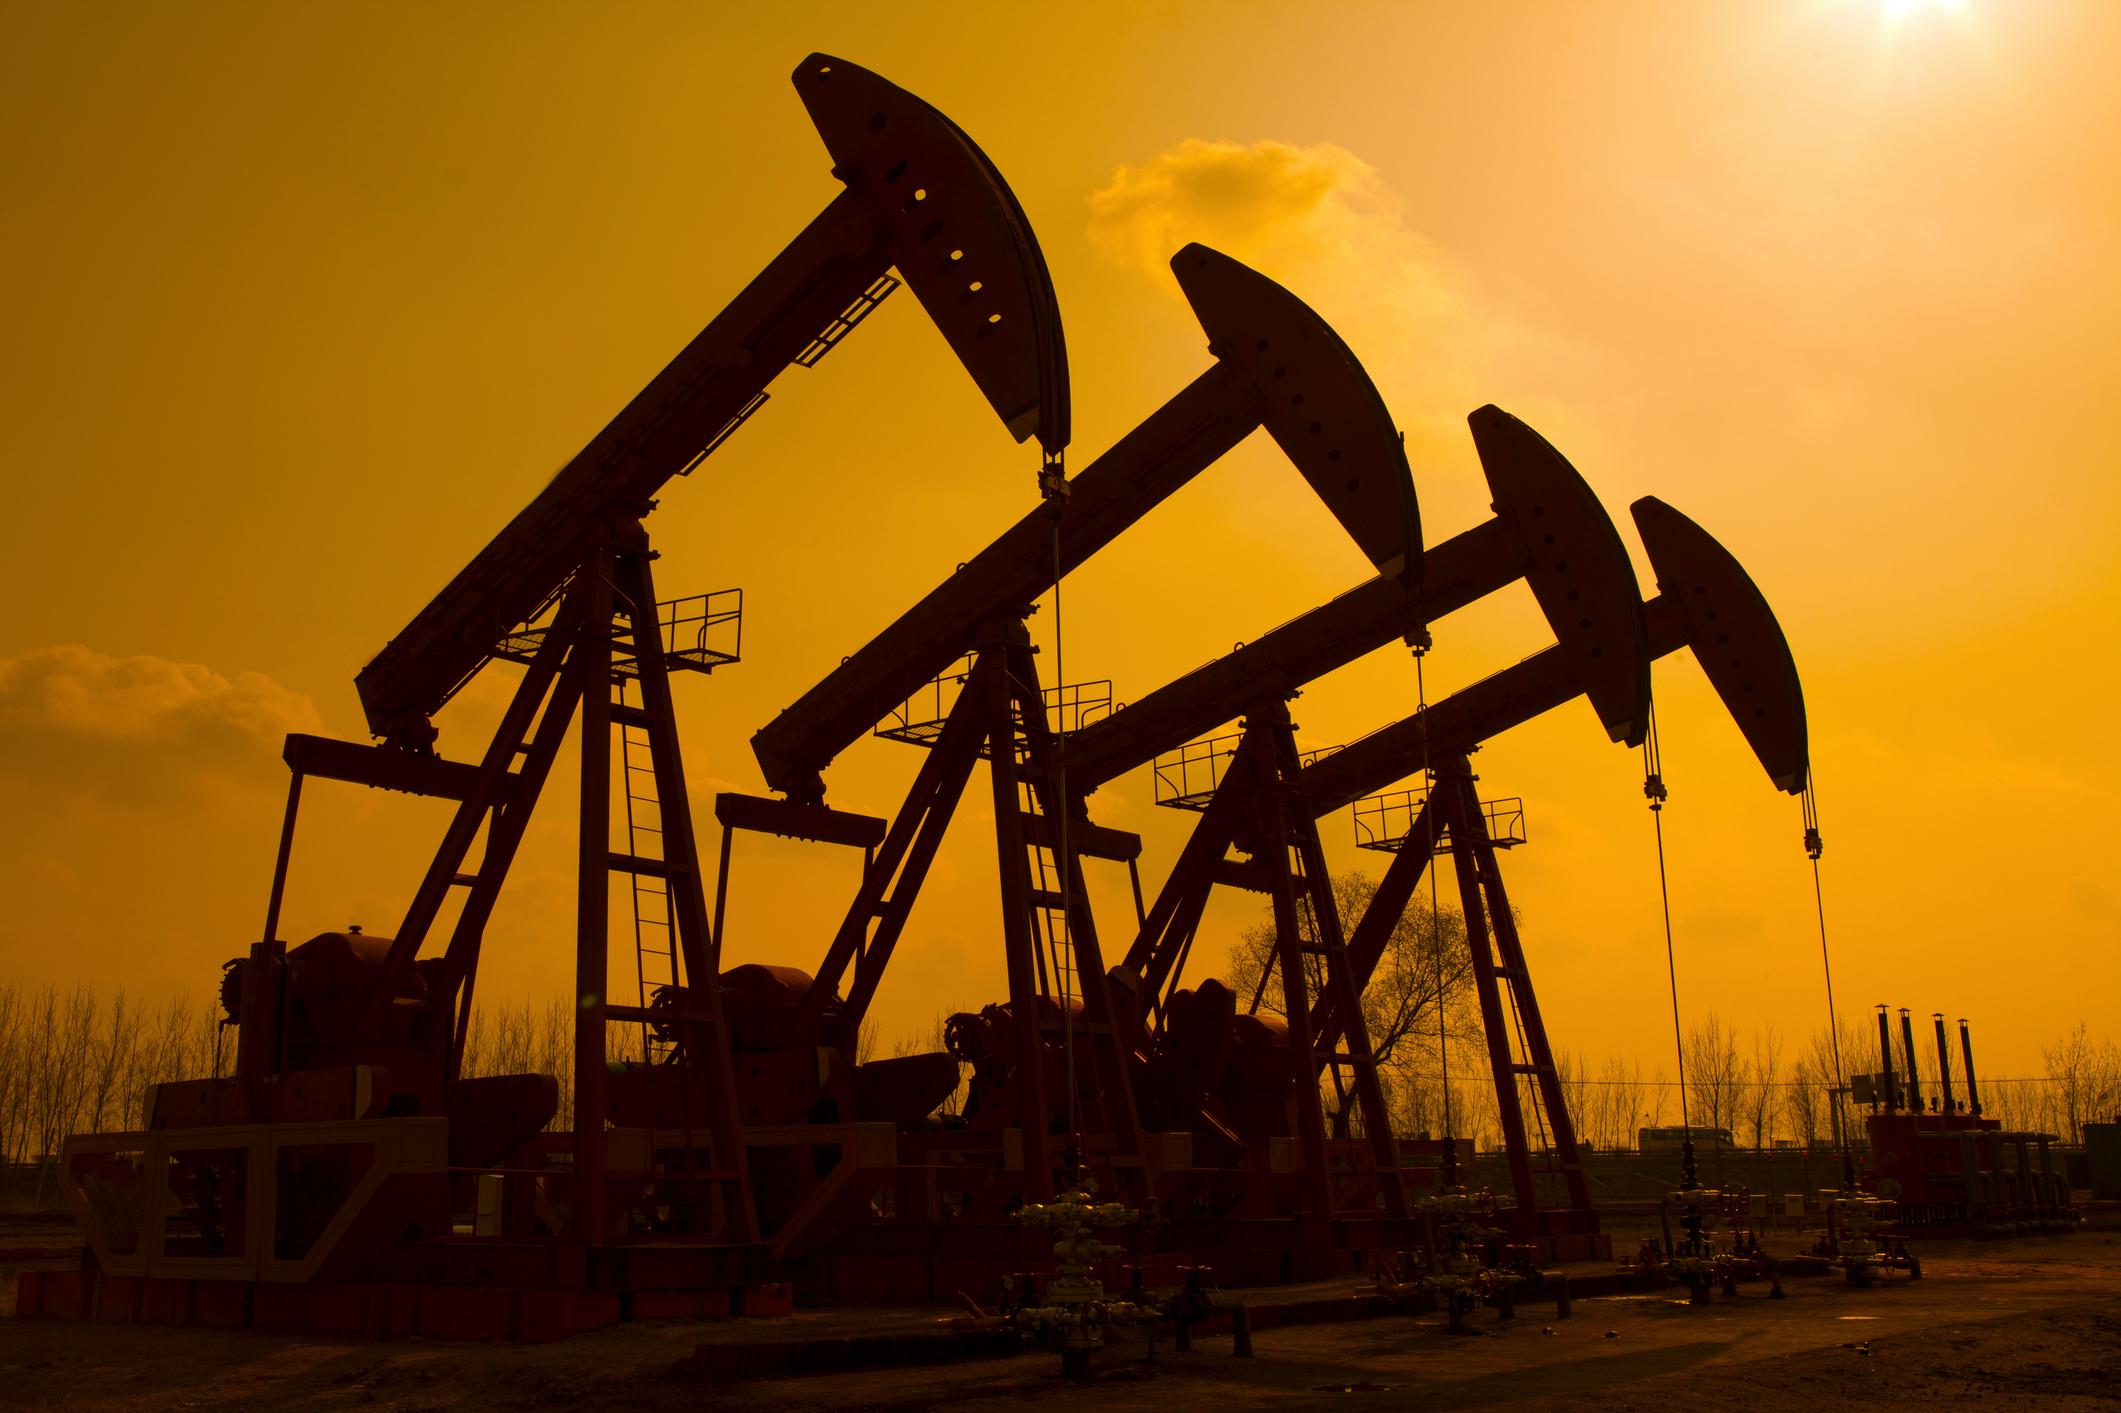 Four oil pumps near sunset.